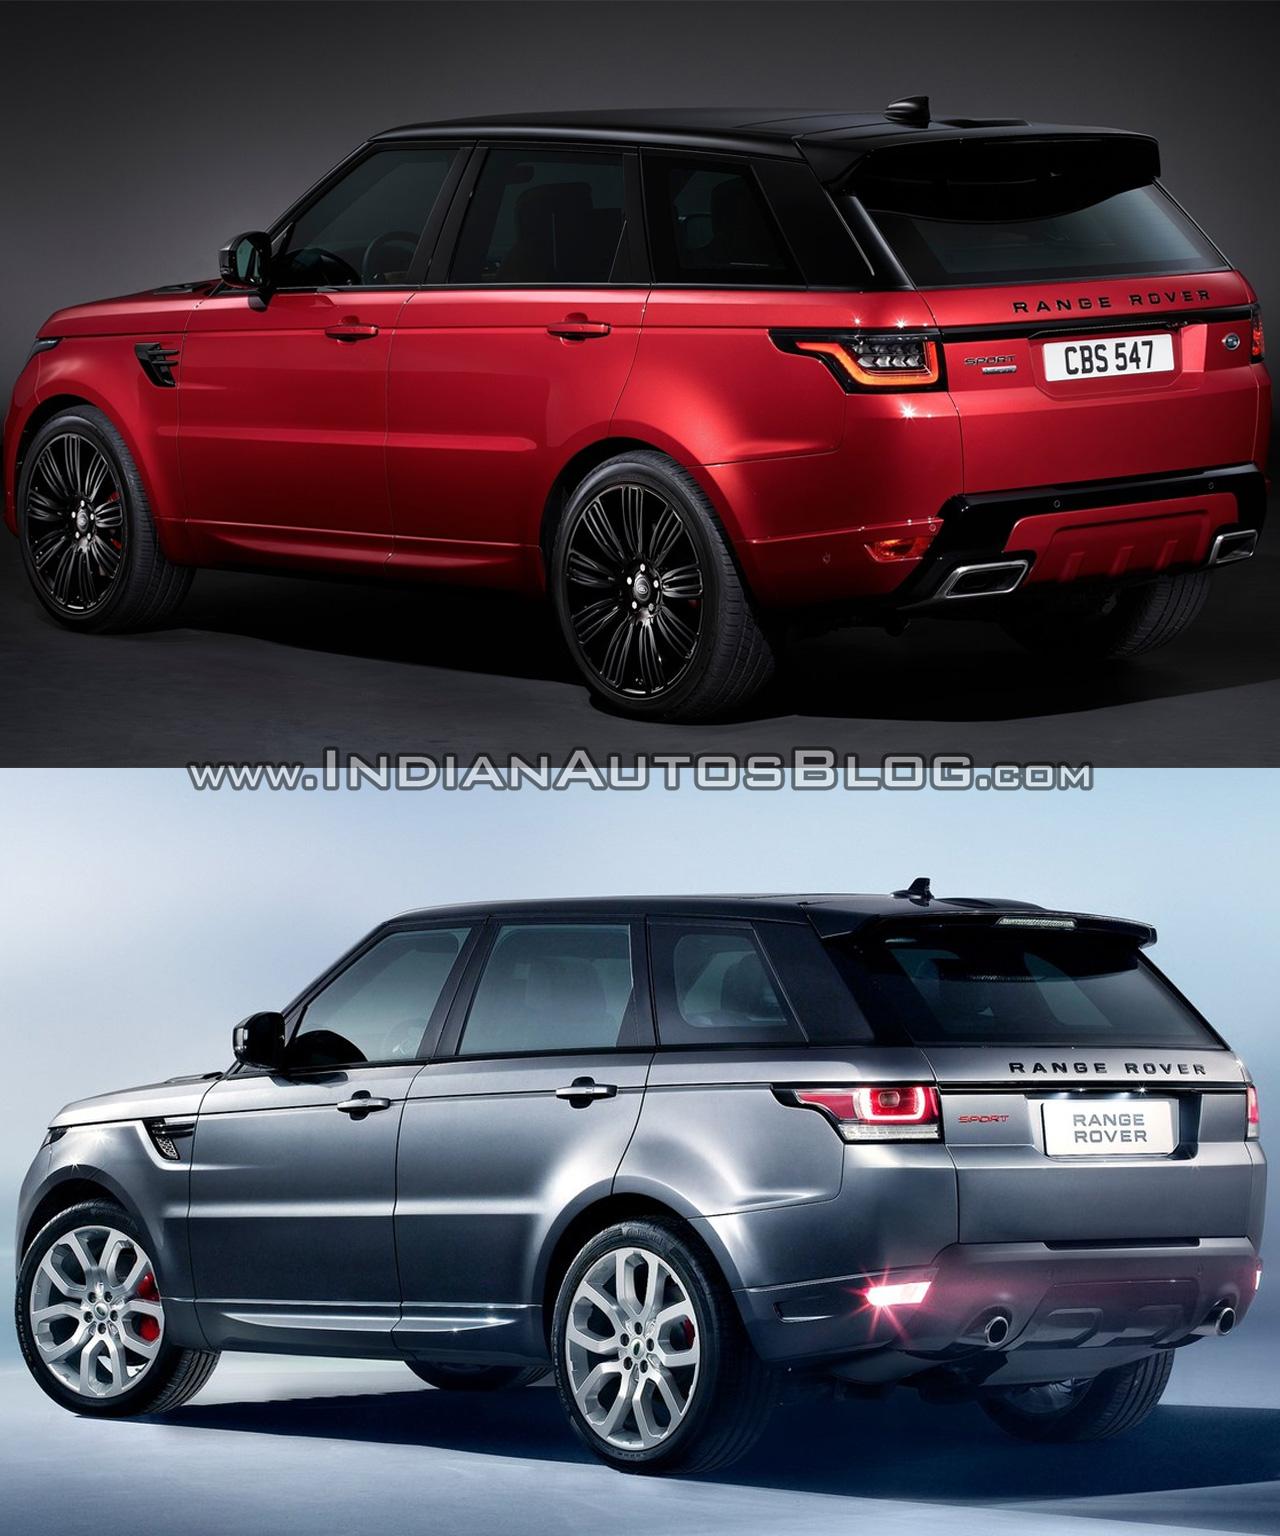 The New 2018 Range Rover Velar Is Expected